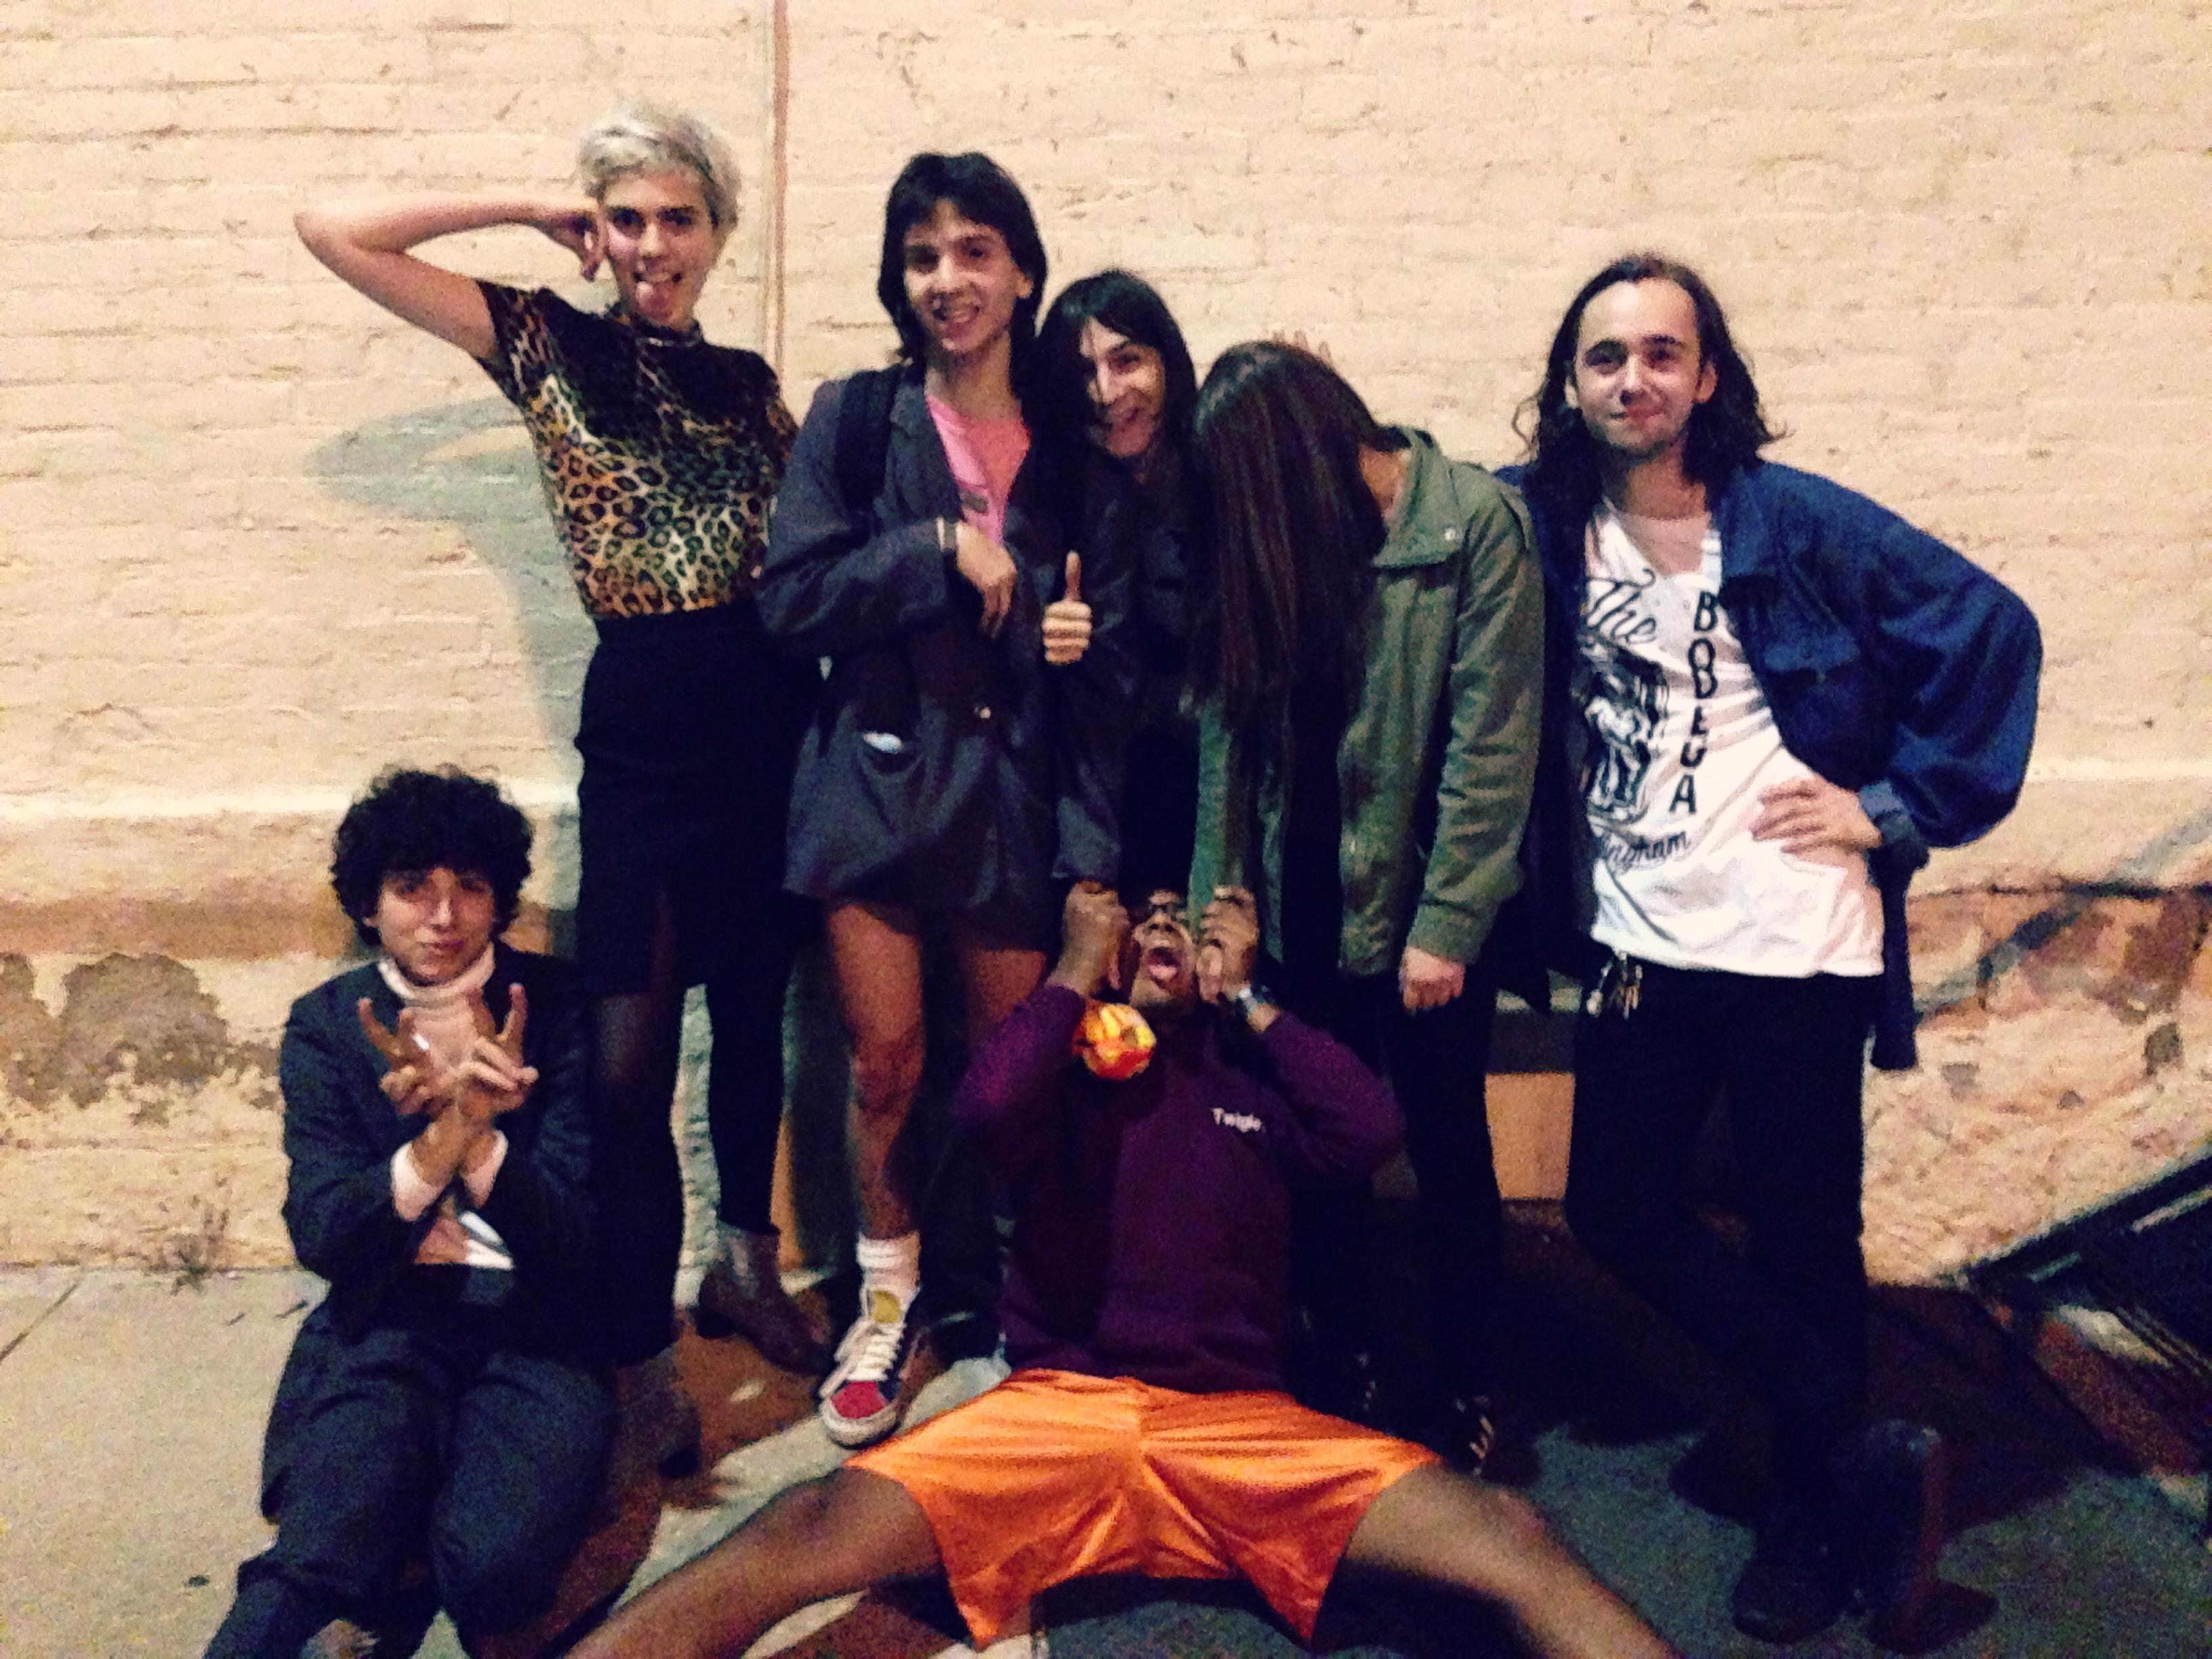 Interviews: Sunflower Bean & The Lemon Twigs